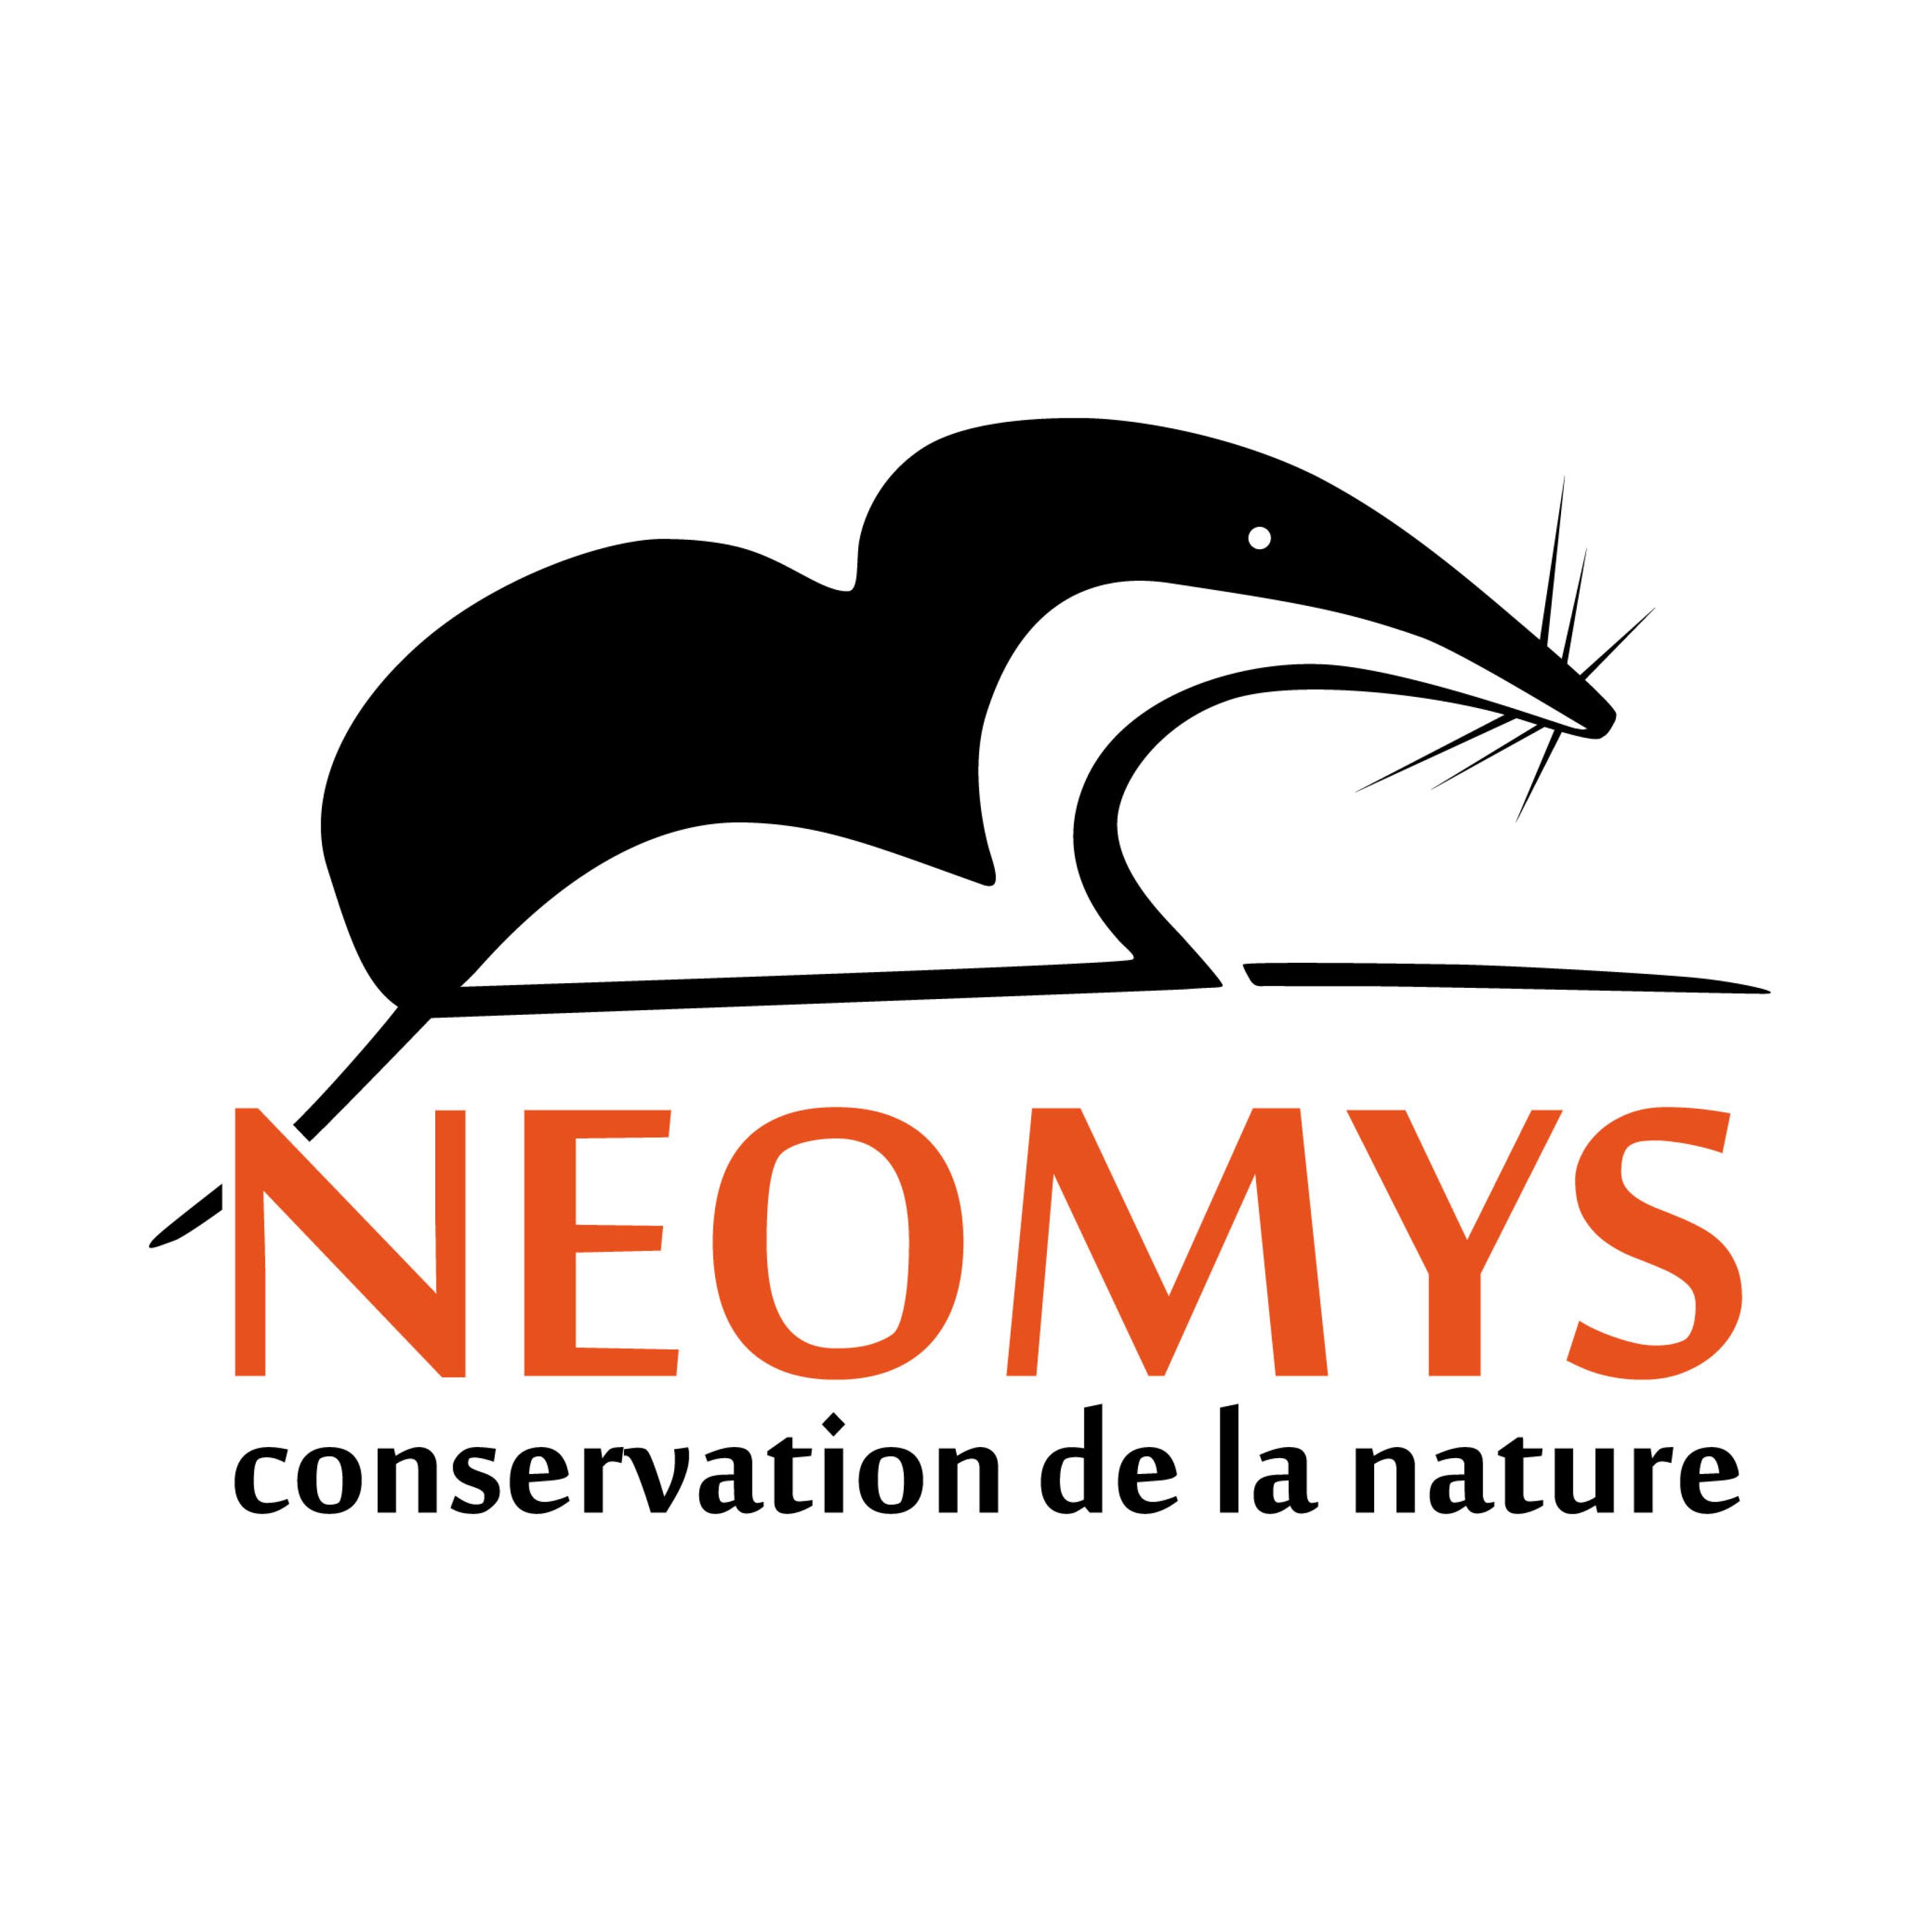 Néomys